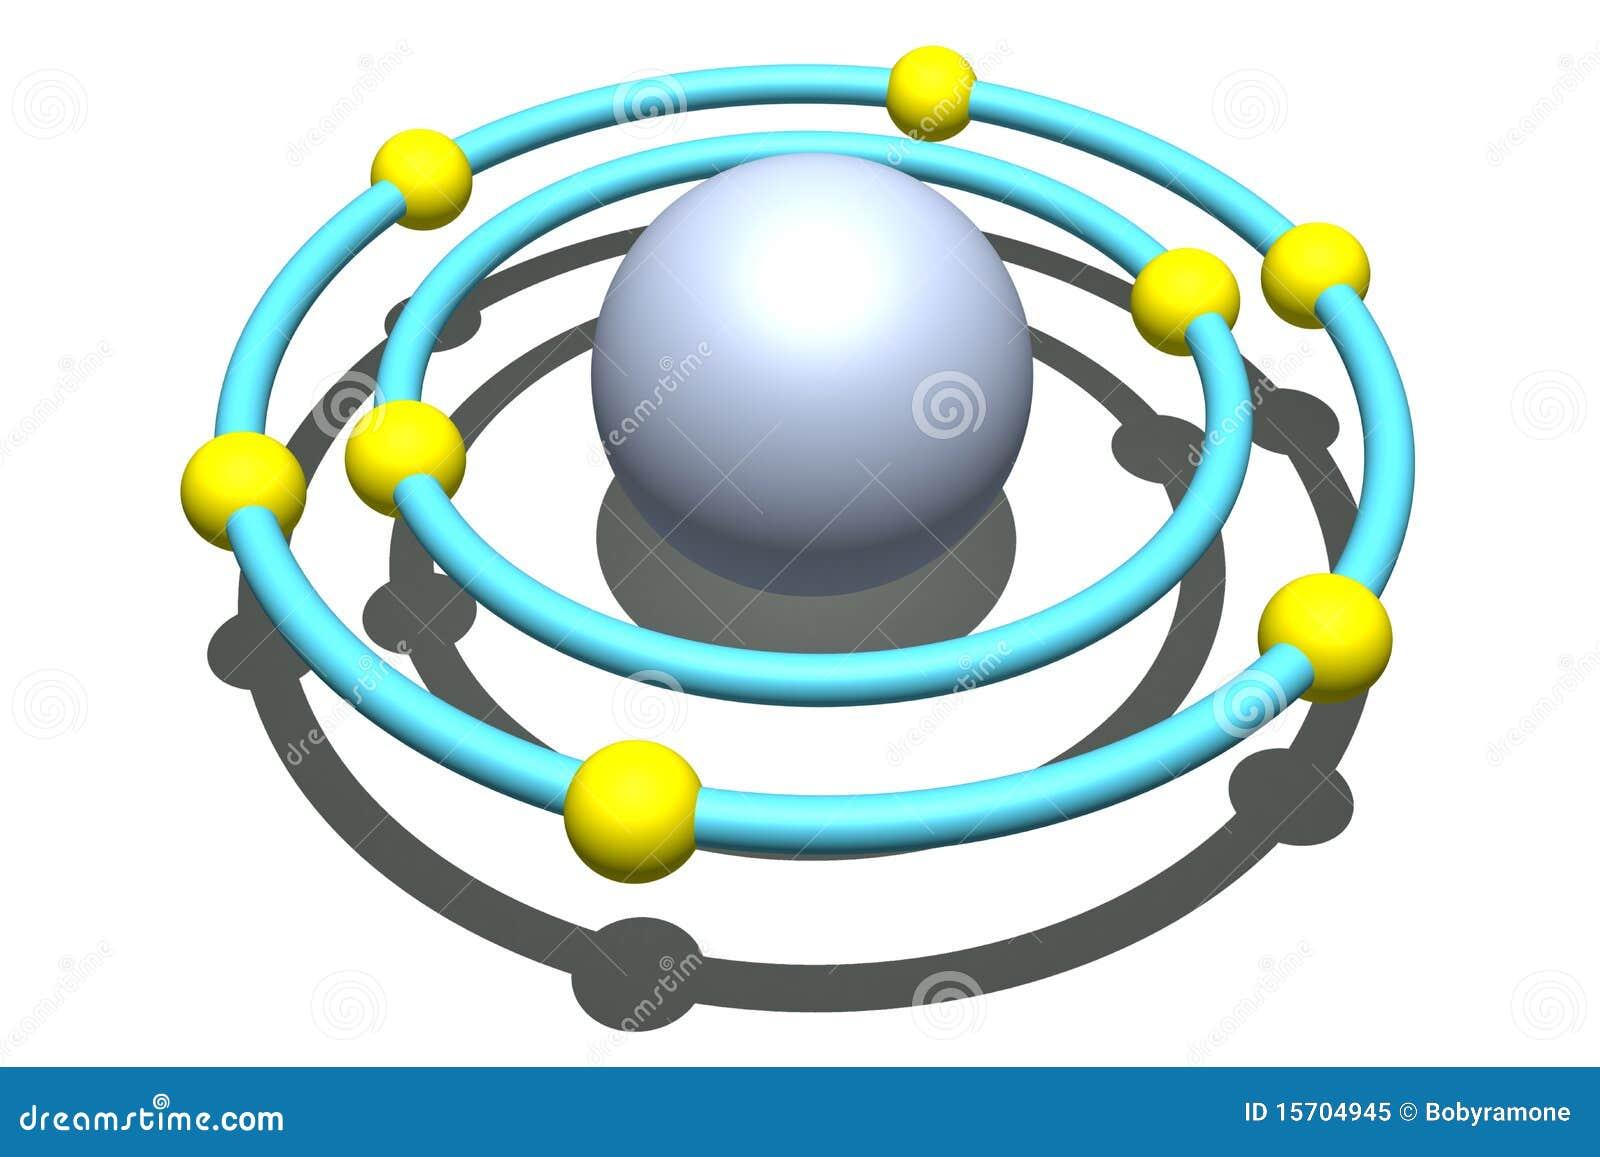 how to make a nitrogen atom model